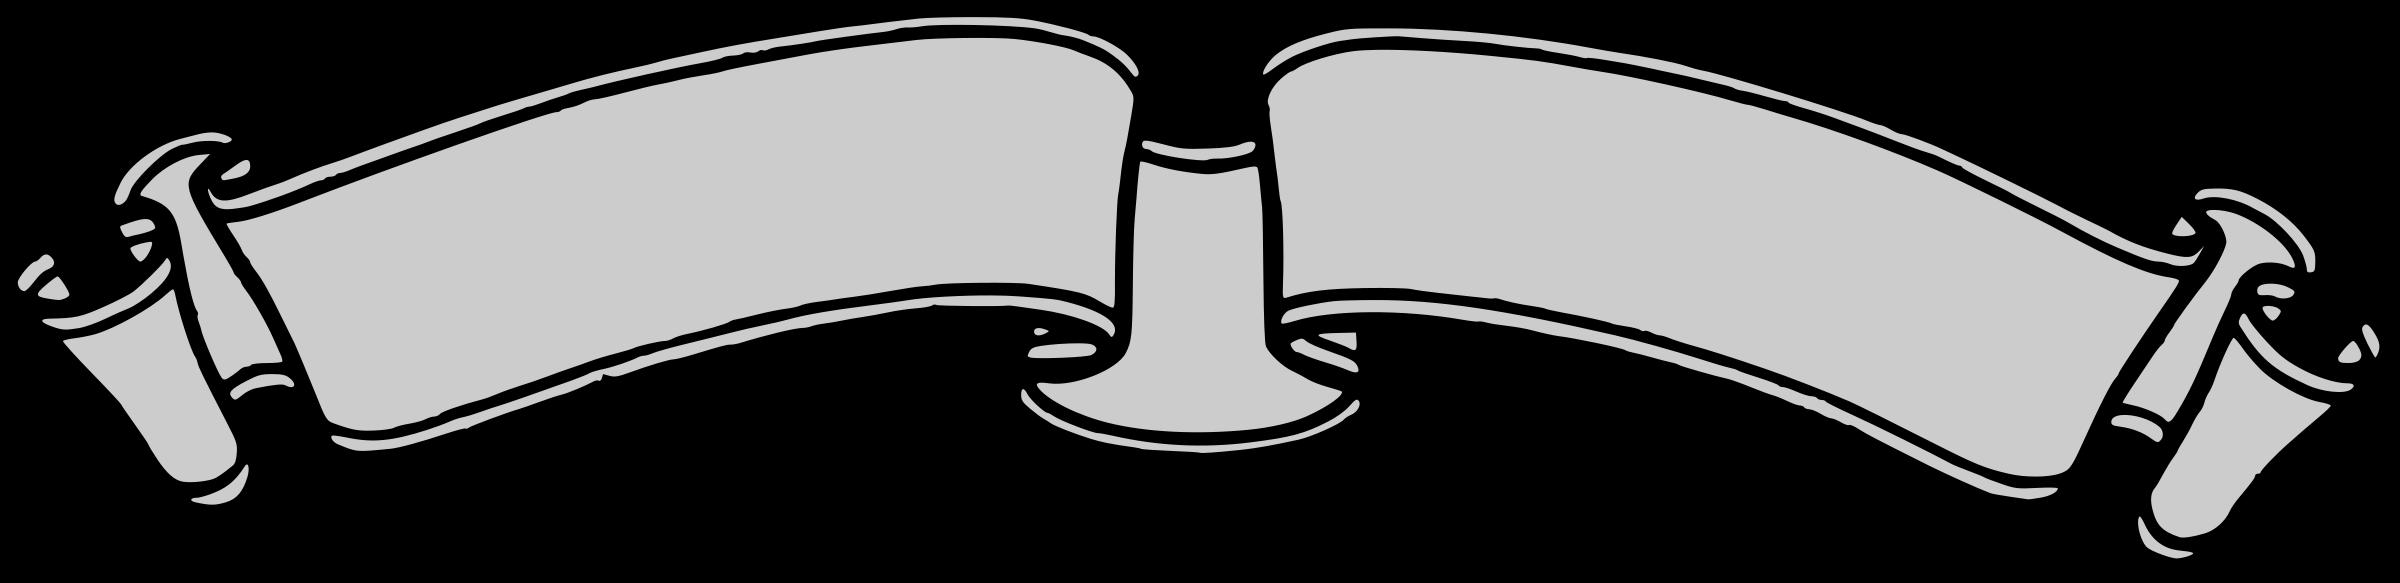 2400x583 Ribbon Banner Clipart